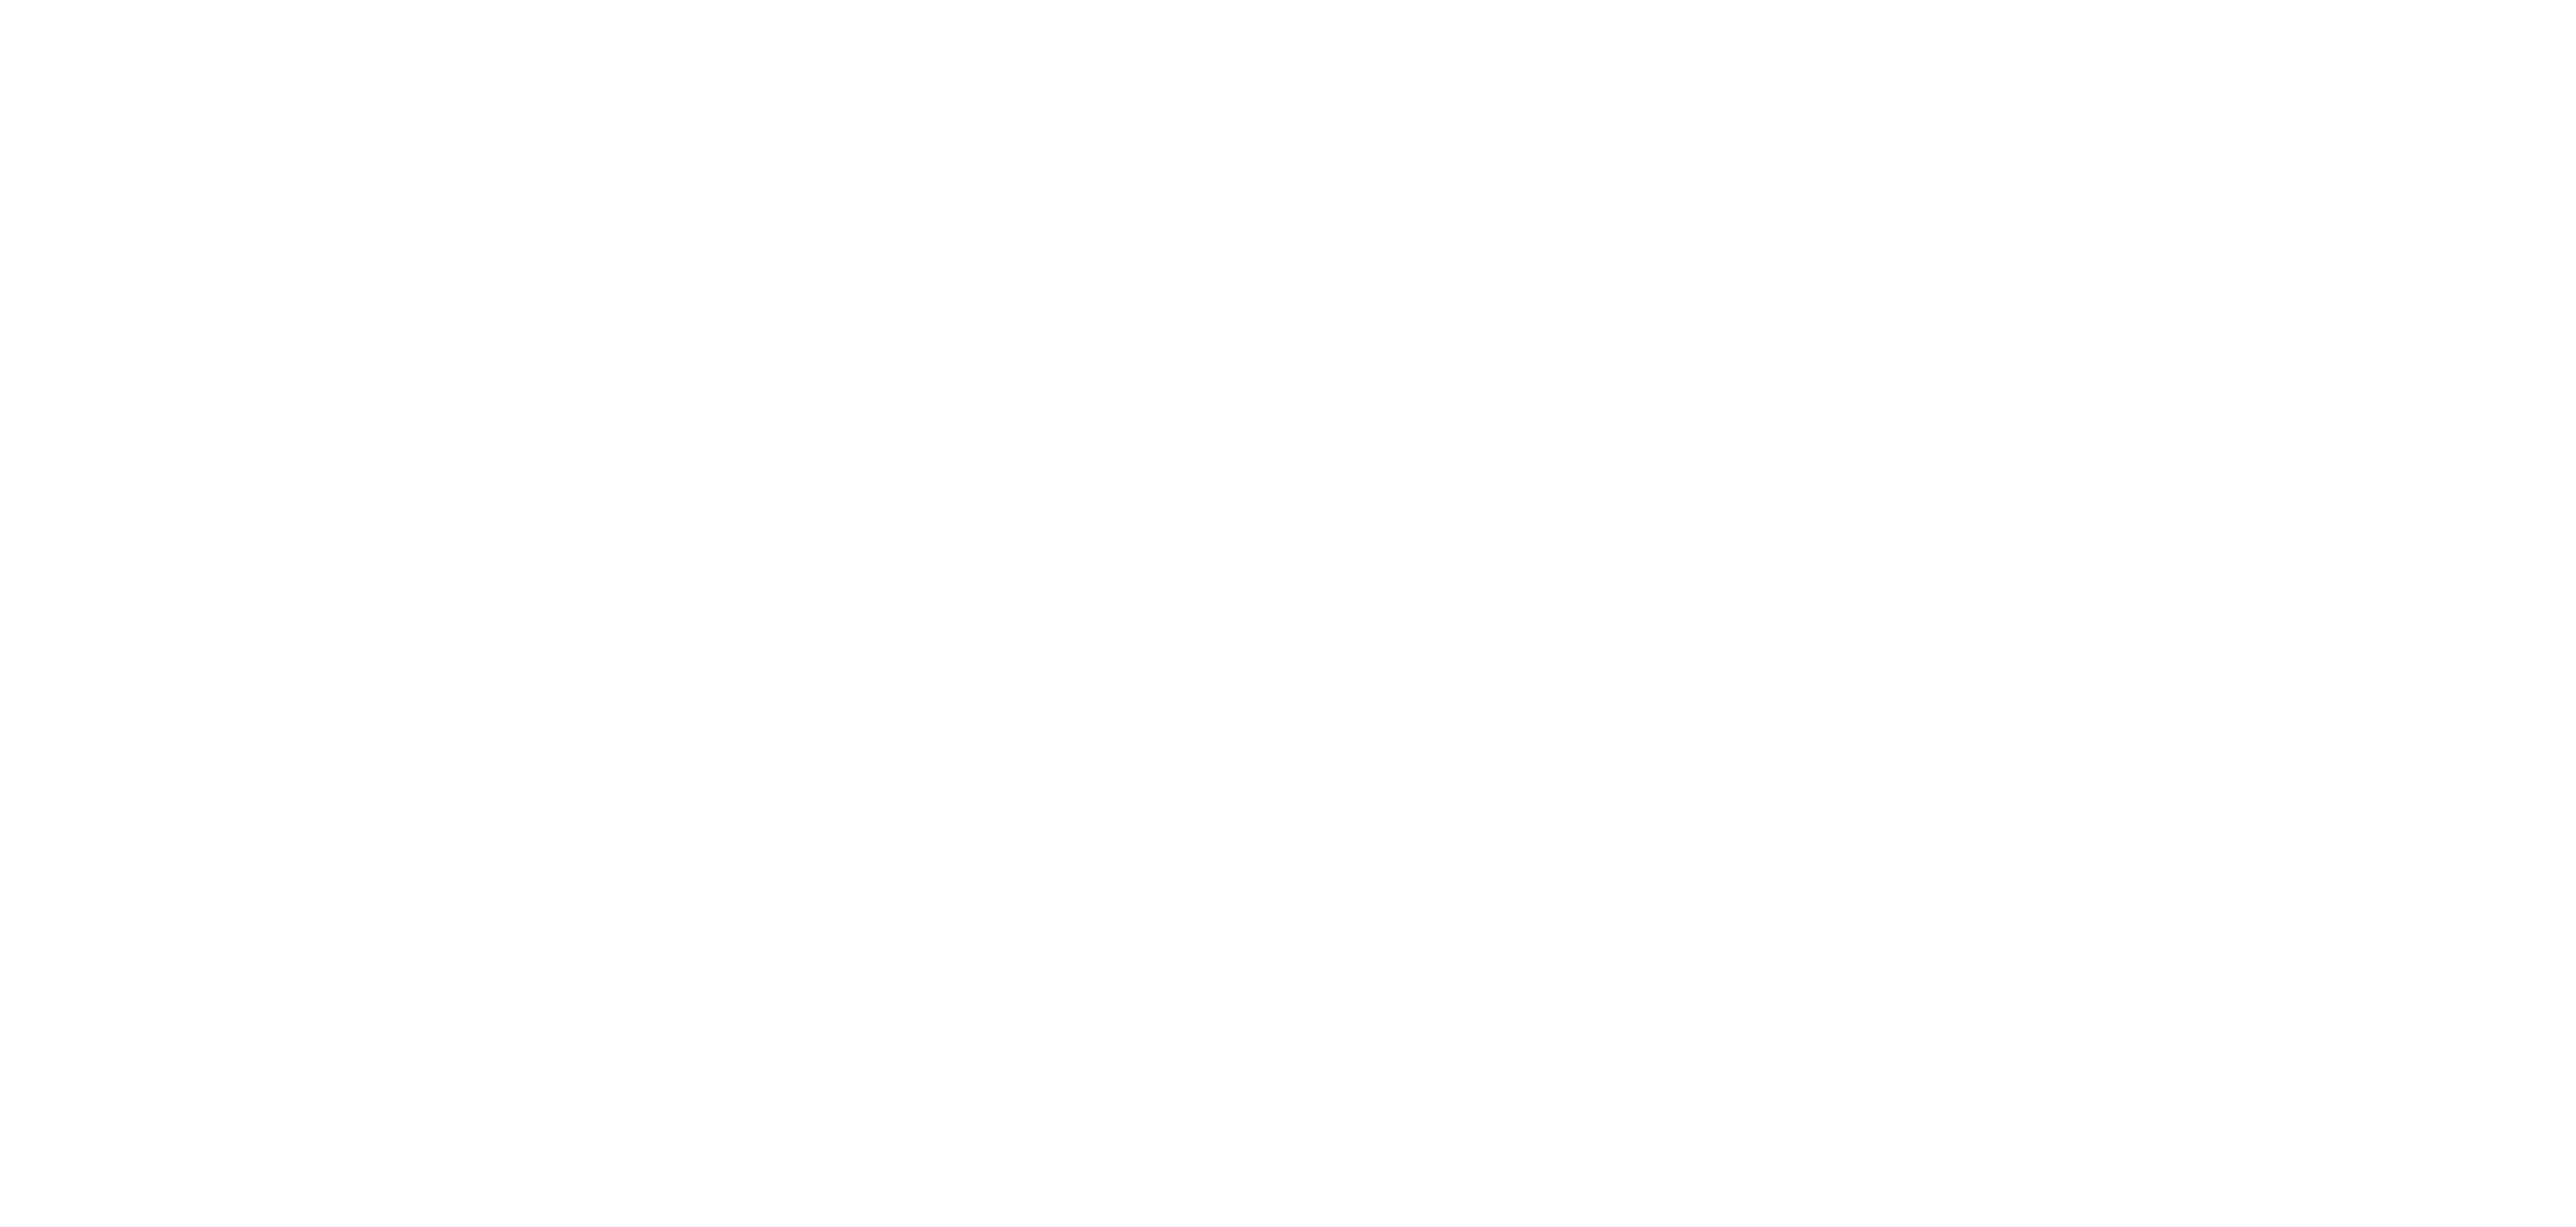 overlay 2